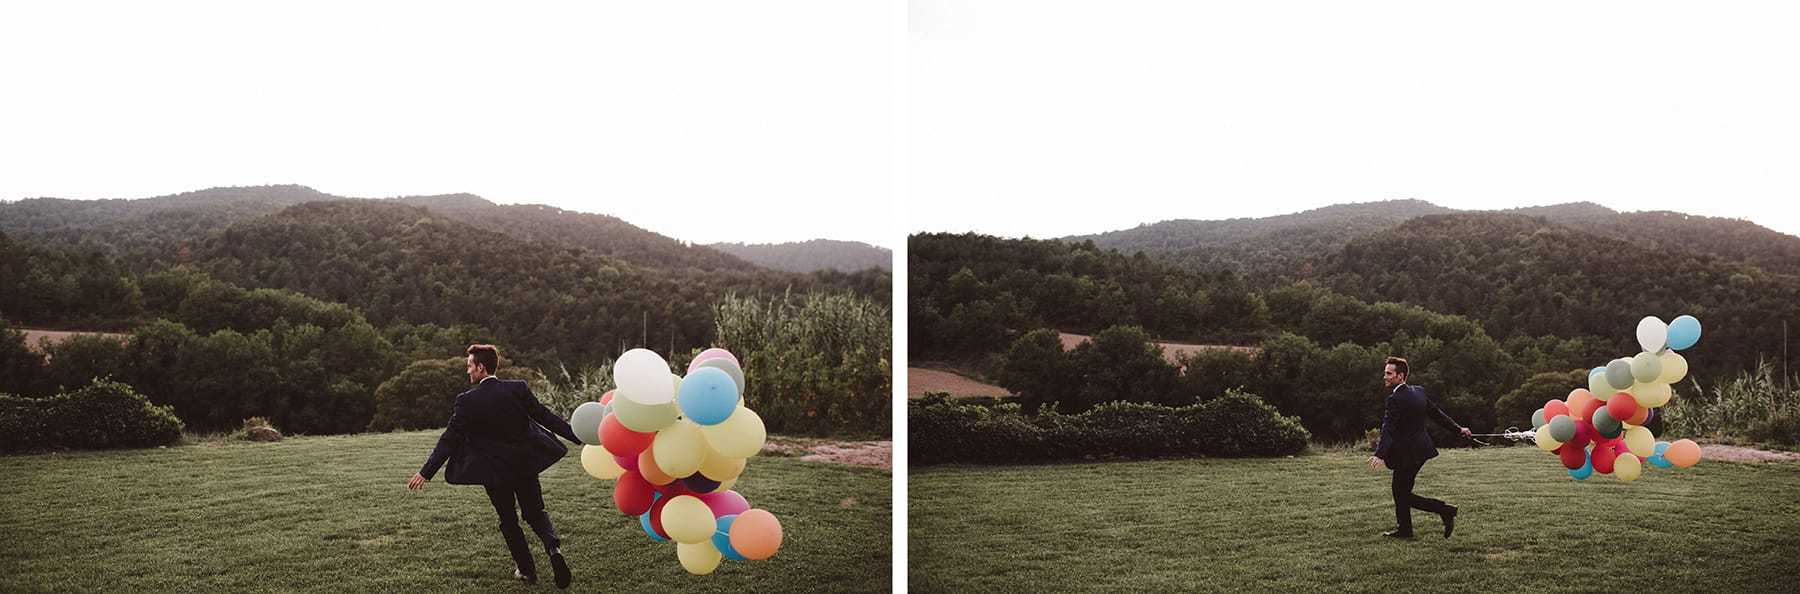 masia_el_dalmau_hilario_sanchez_fotografo_boda_barcelona_183